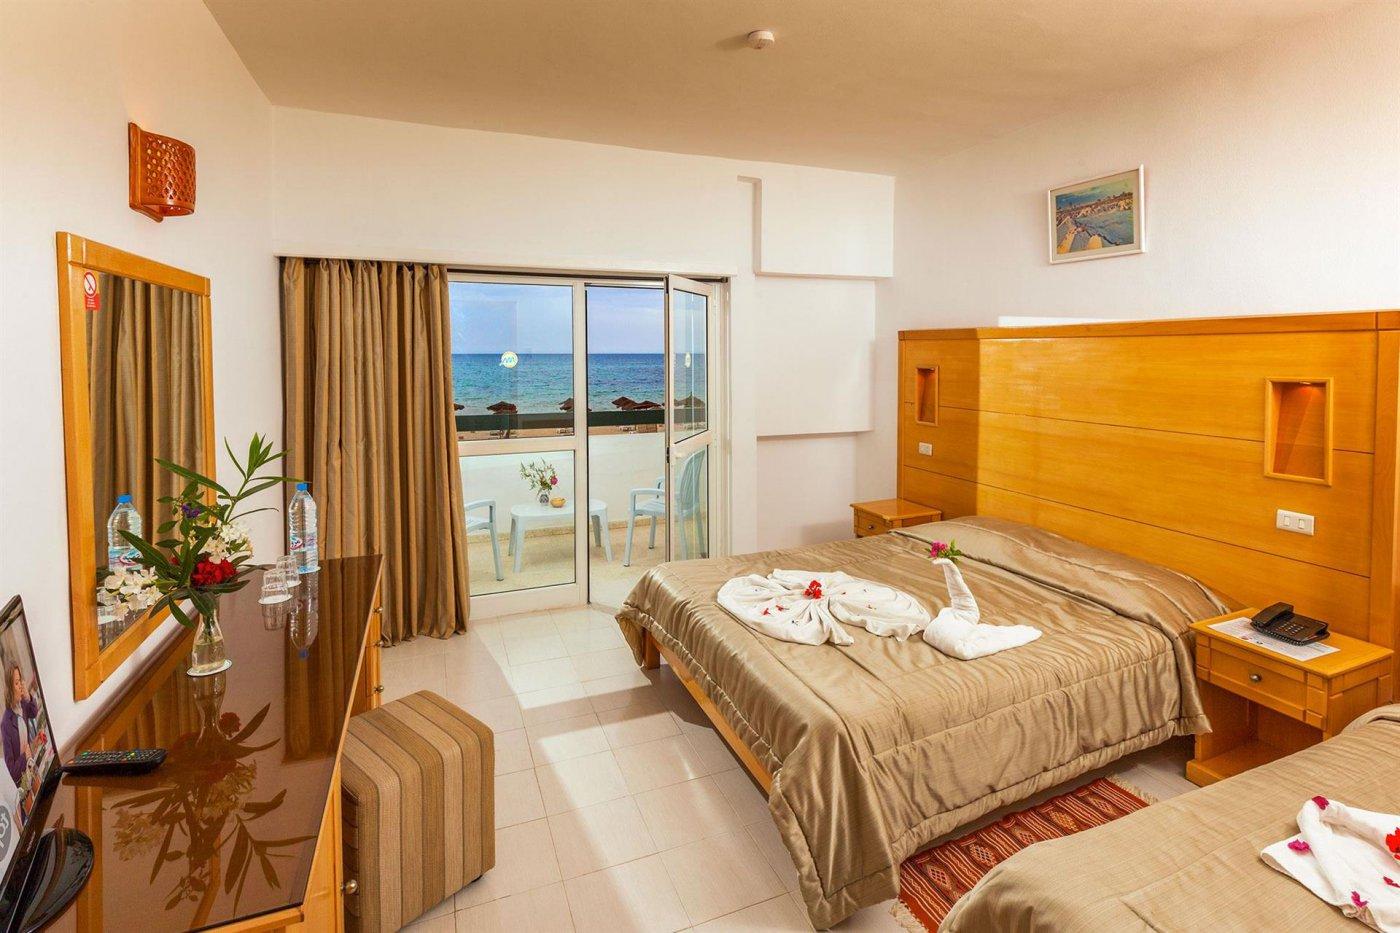 Фото отеля Magic Hammamet Beach 3* (Мэджик Хаммамет Бич 3*)